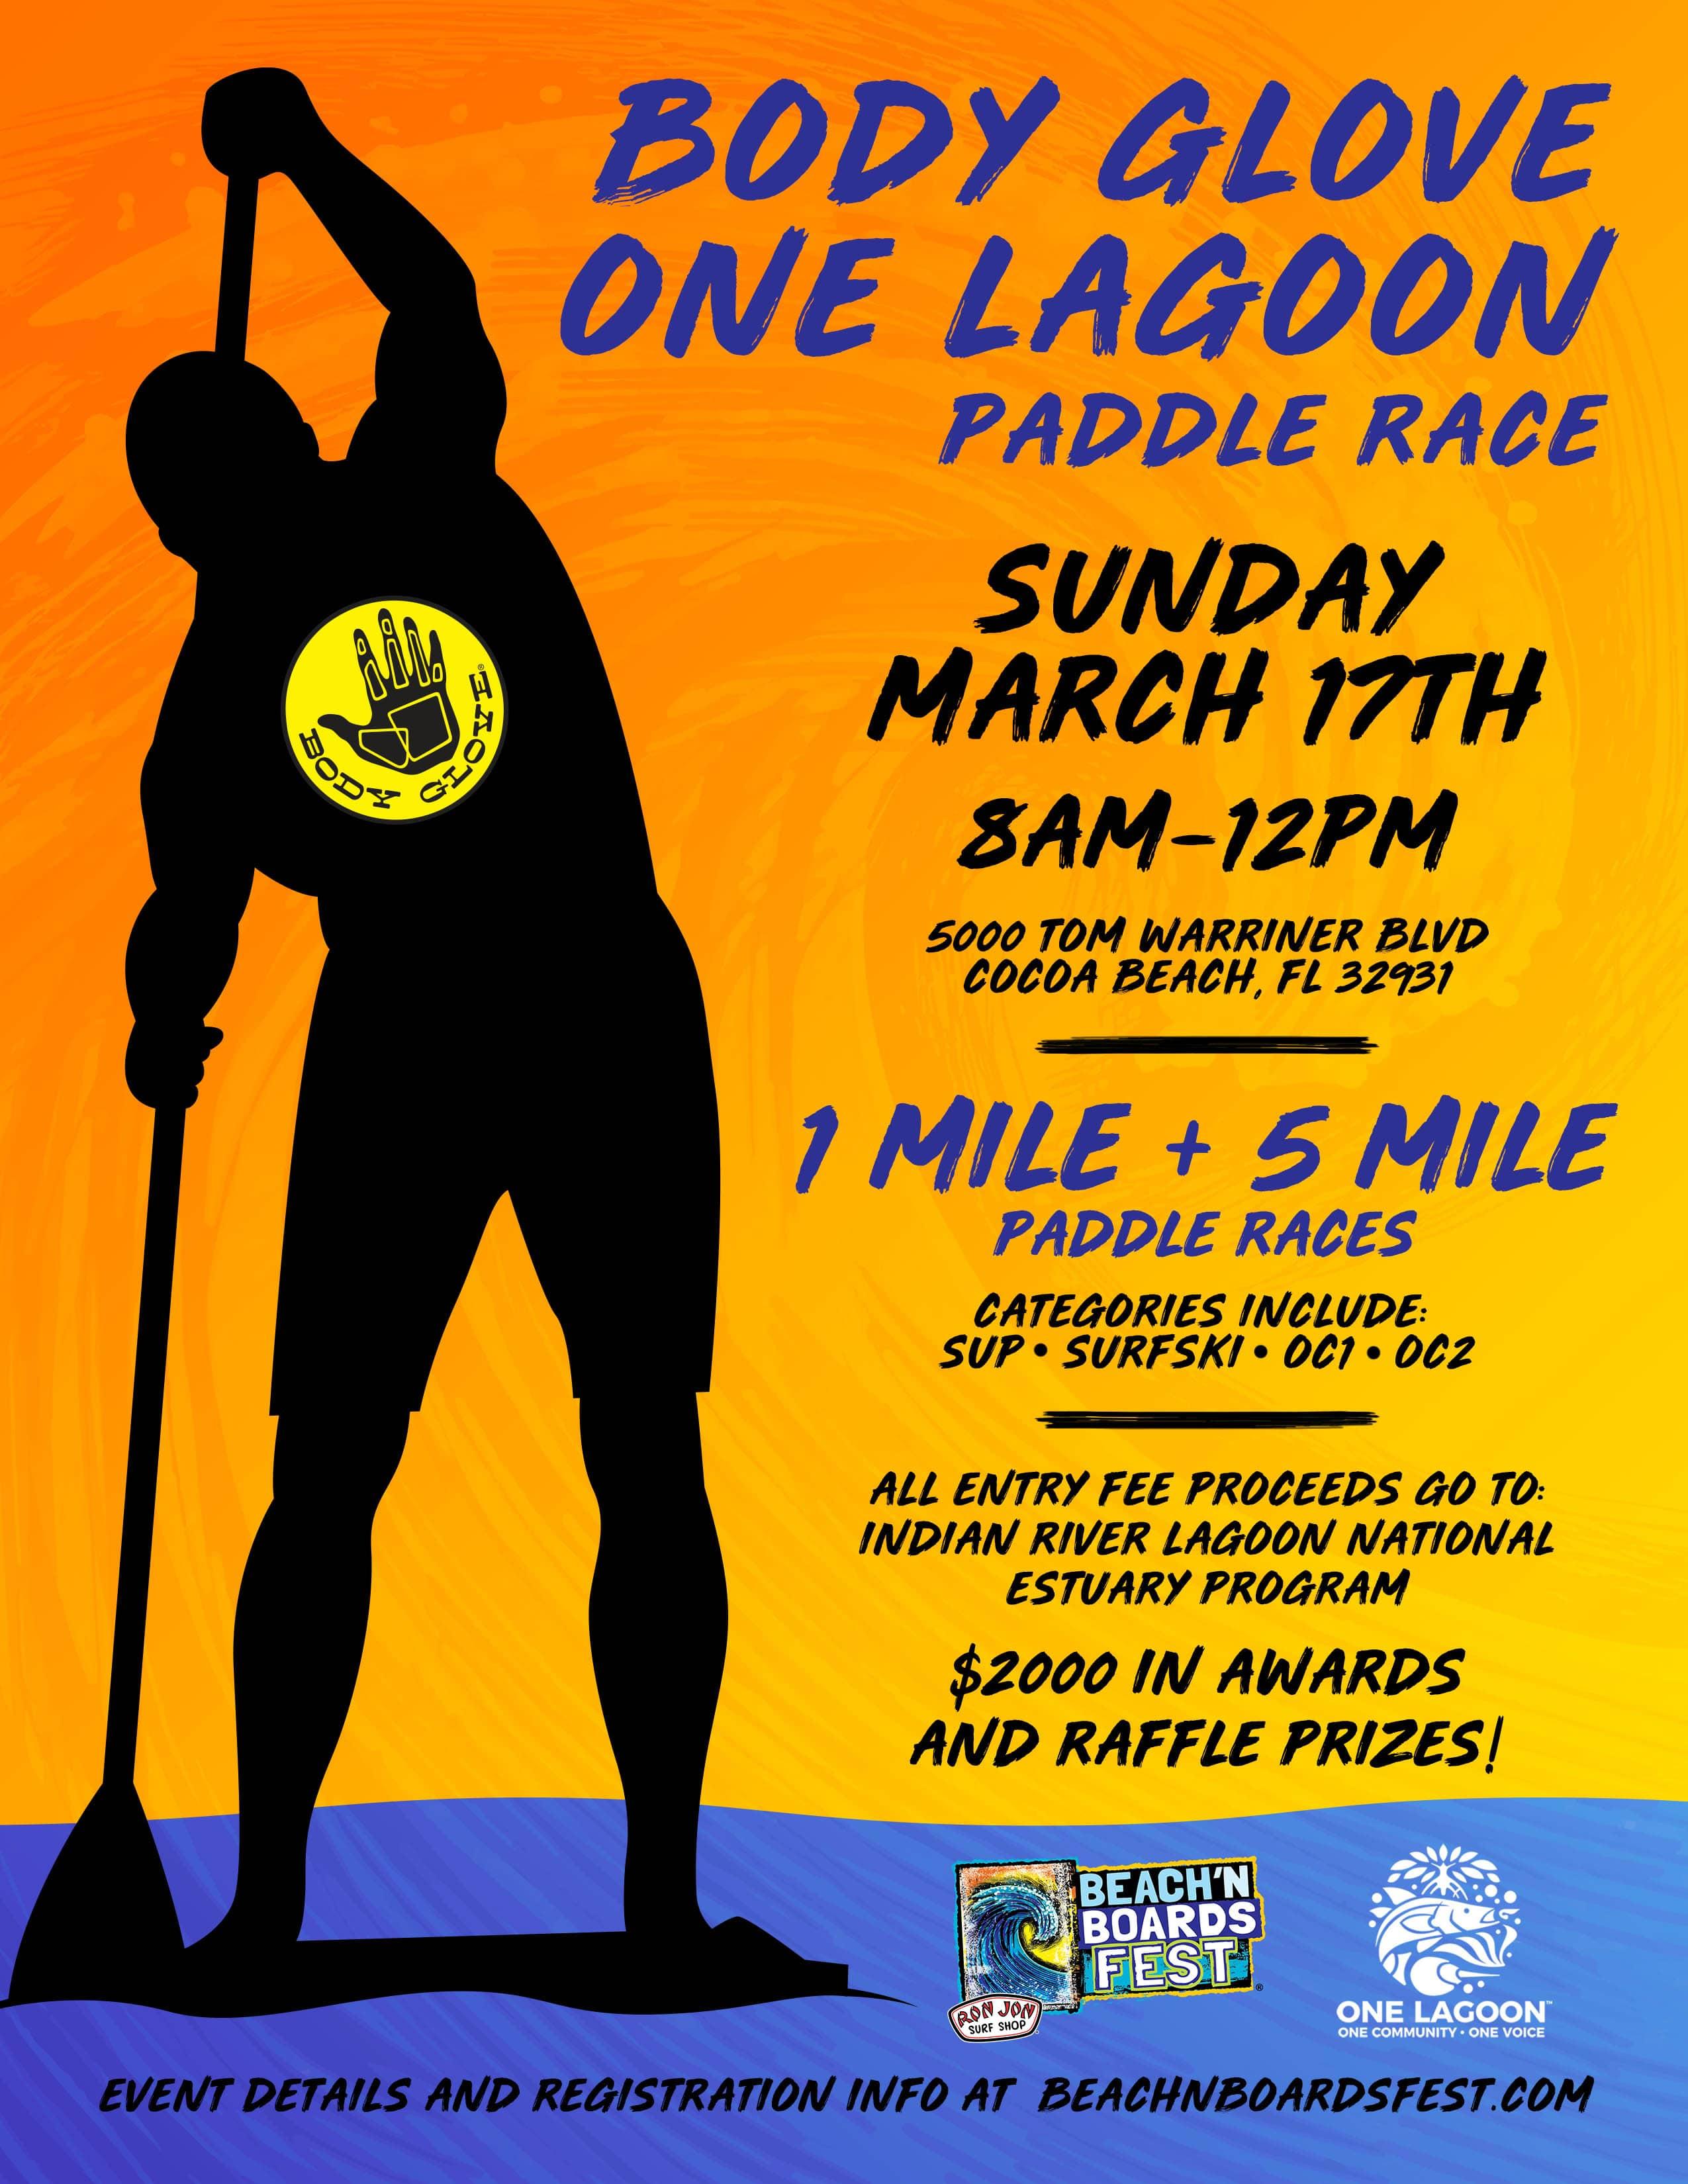 2019 Body Glove One Lagoon Paddle Race